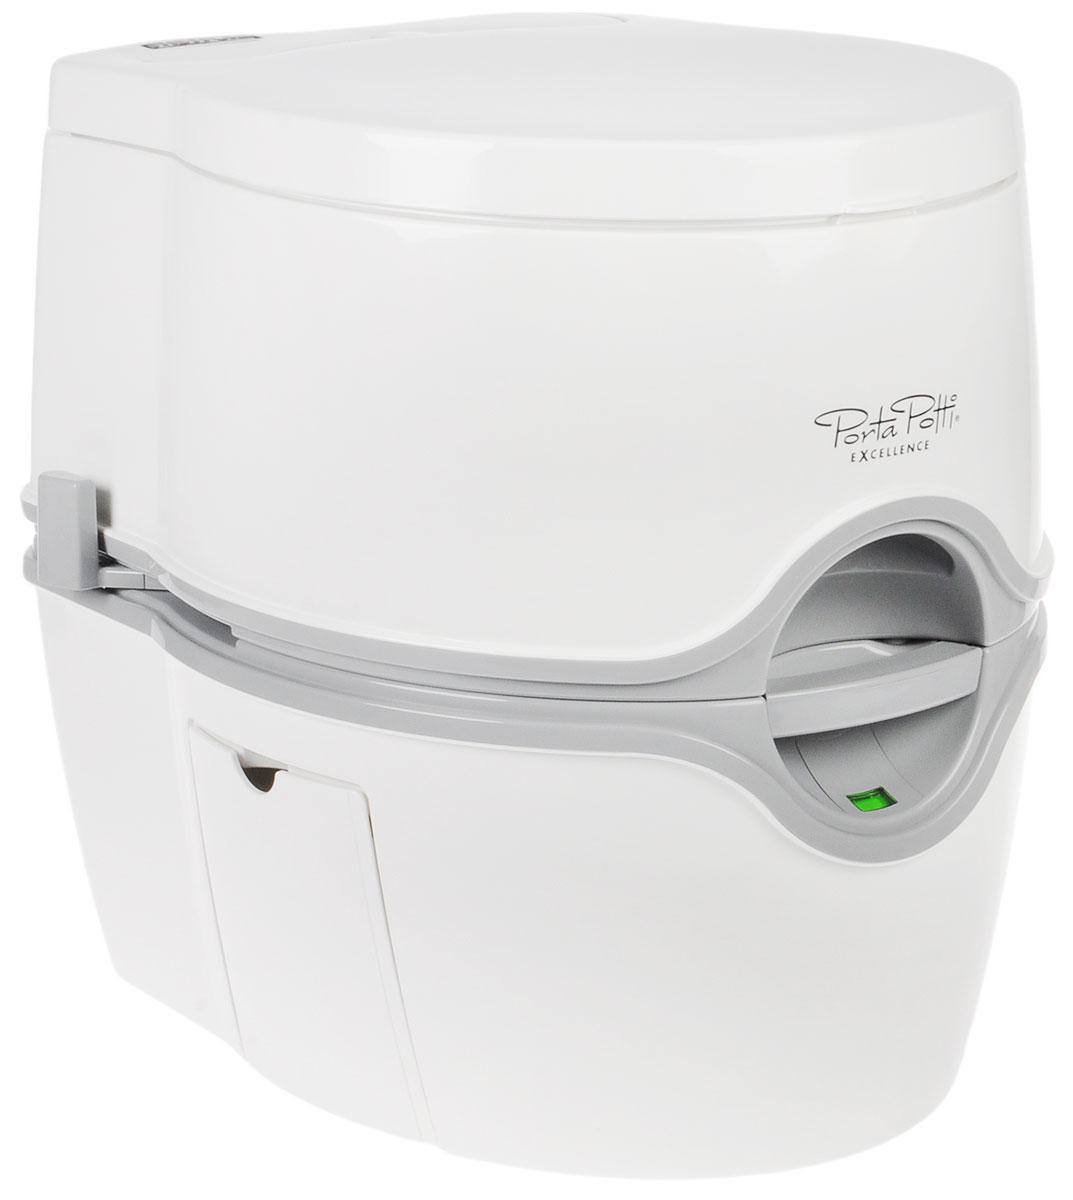 Биотуалет Thetford Porta Potti Excellence Electric, цвет: белый биотуалет thetford porta potti excellence отзывы